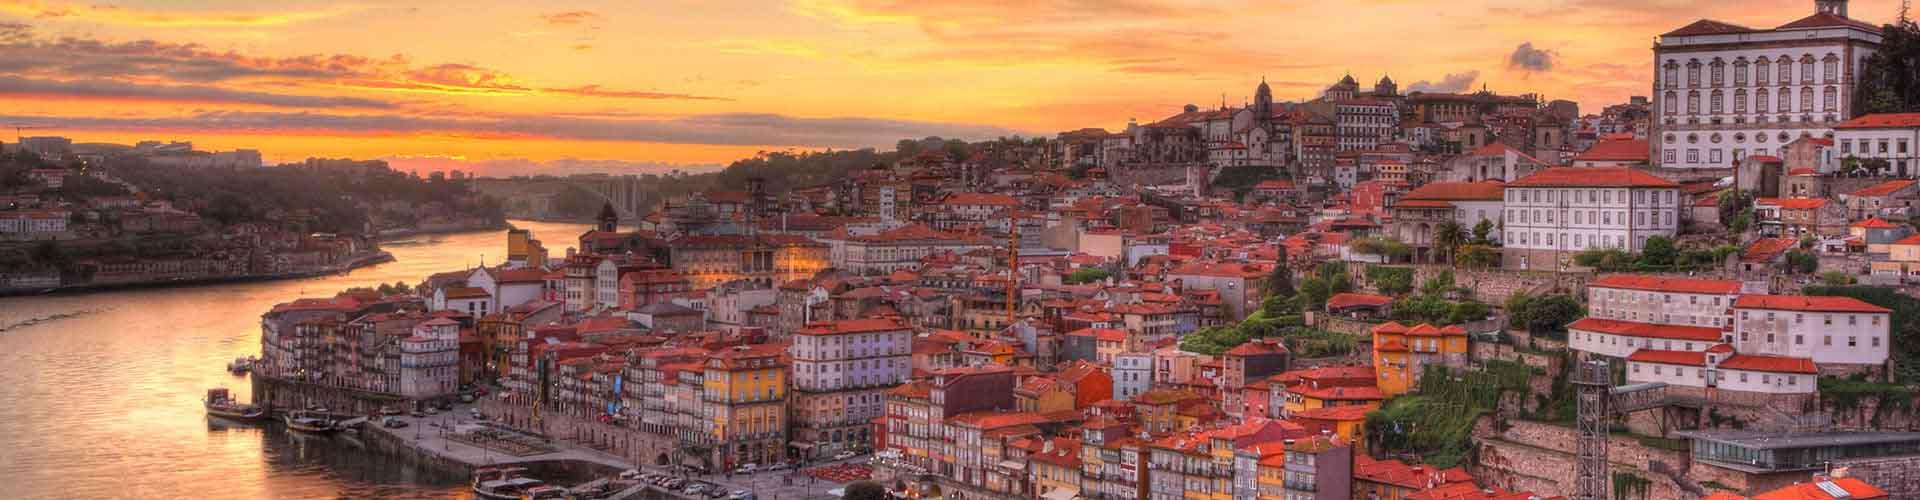 Porto - Zimmer in Porto. Karten für Porto. Fotos und Bewertungen für jedes Zimmer in Porto.